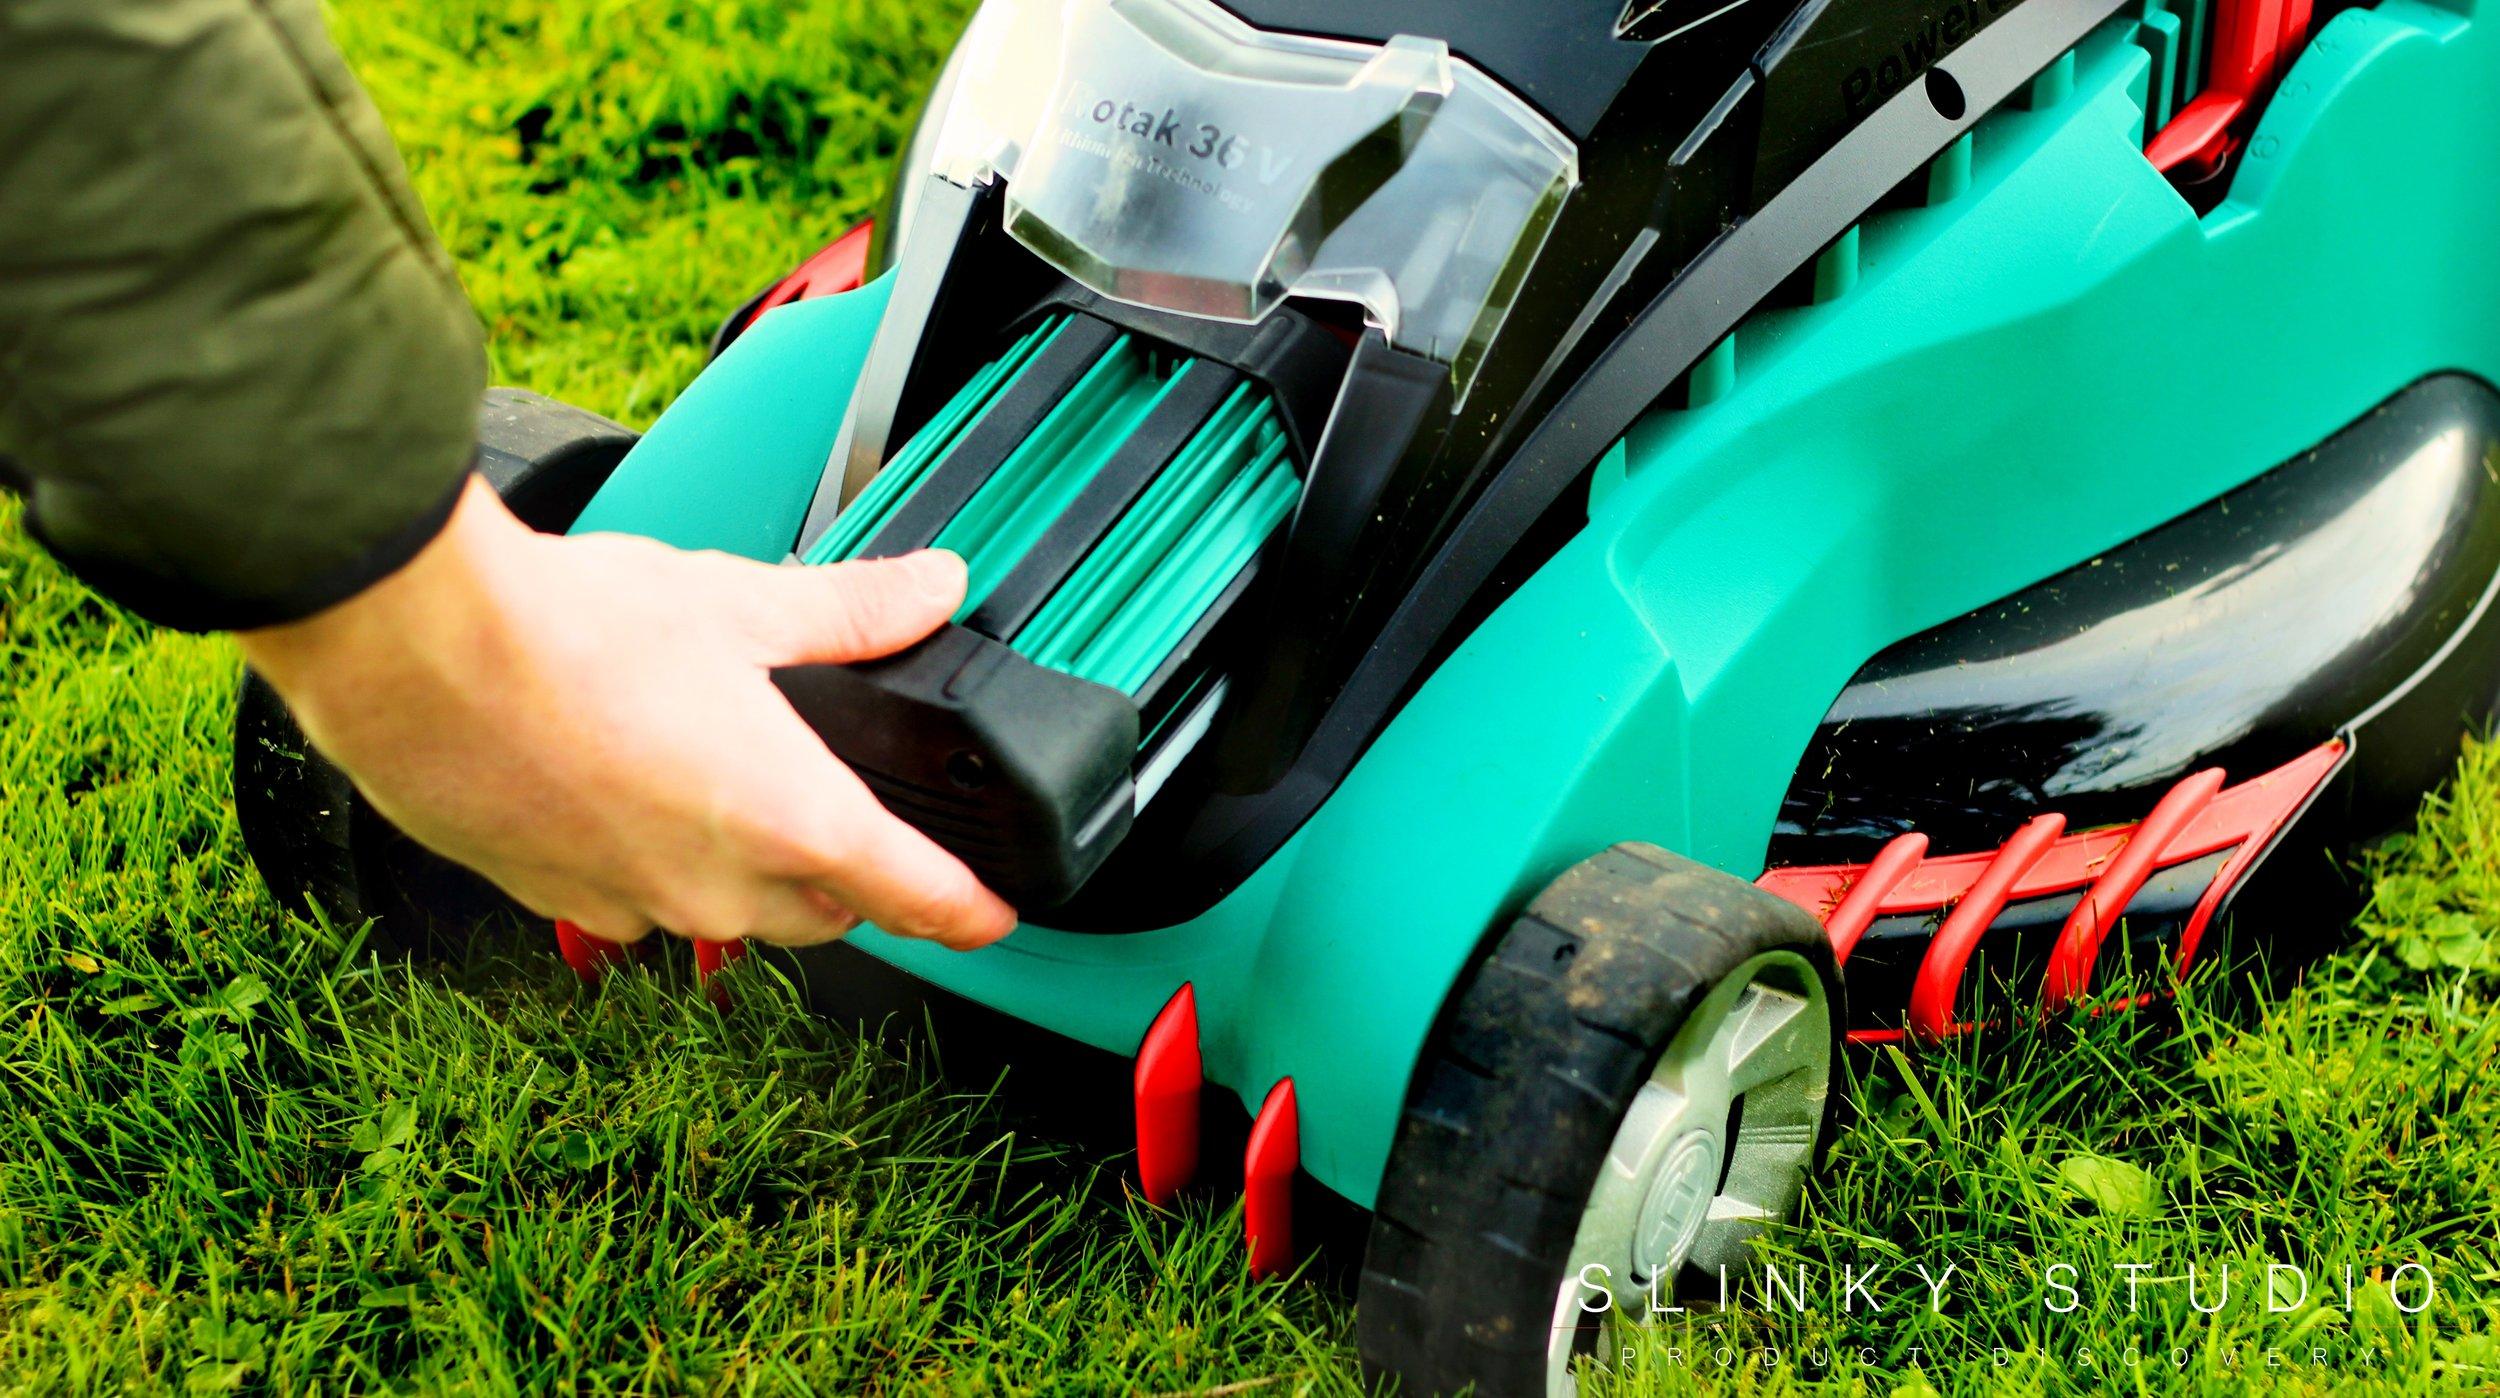 Bosch Rotak 43 LI Ergoflex Cordless Lawnmower Inserting Battery.jpg